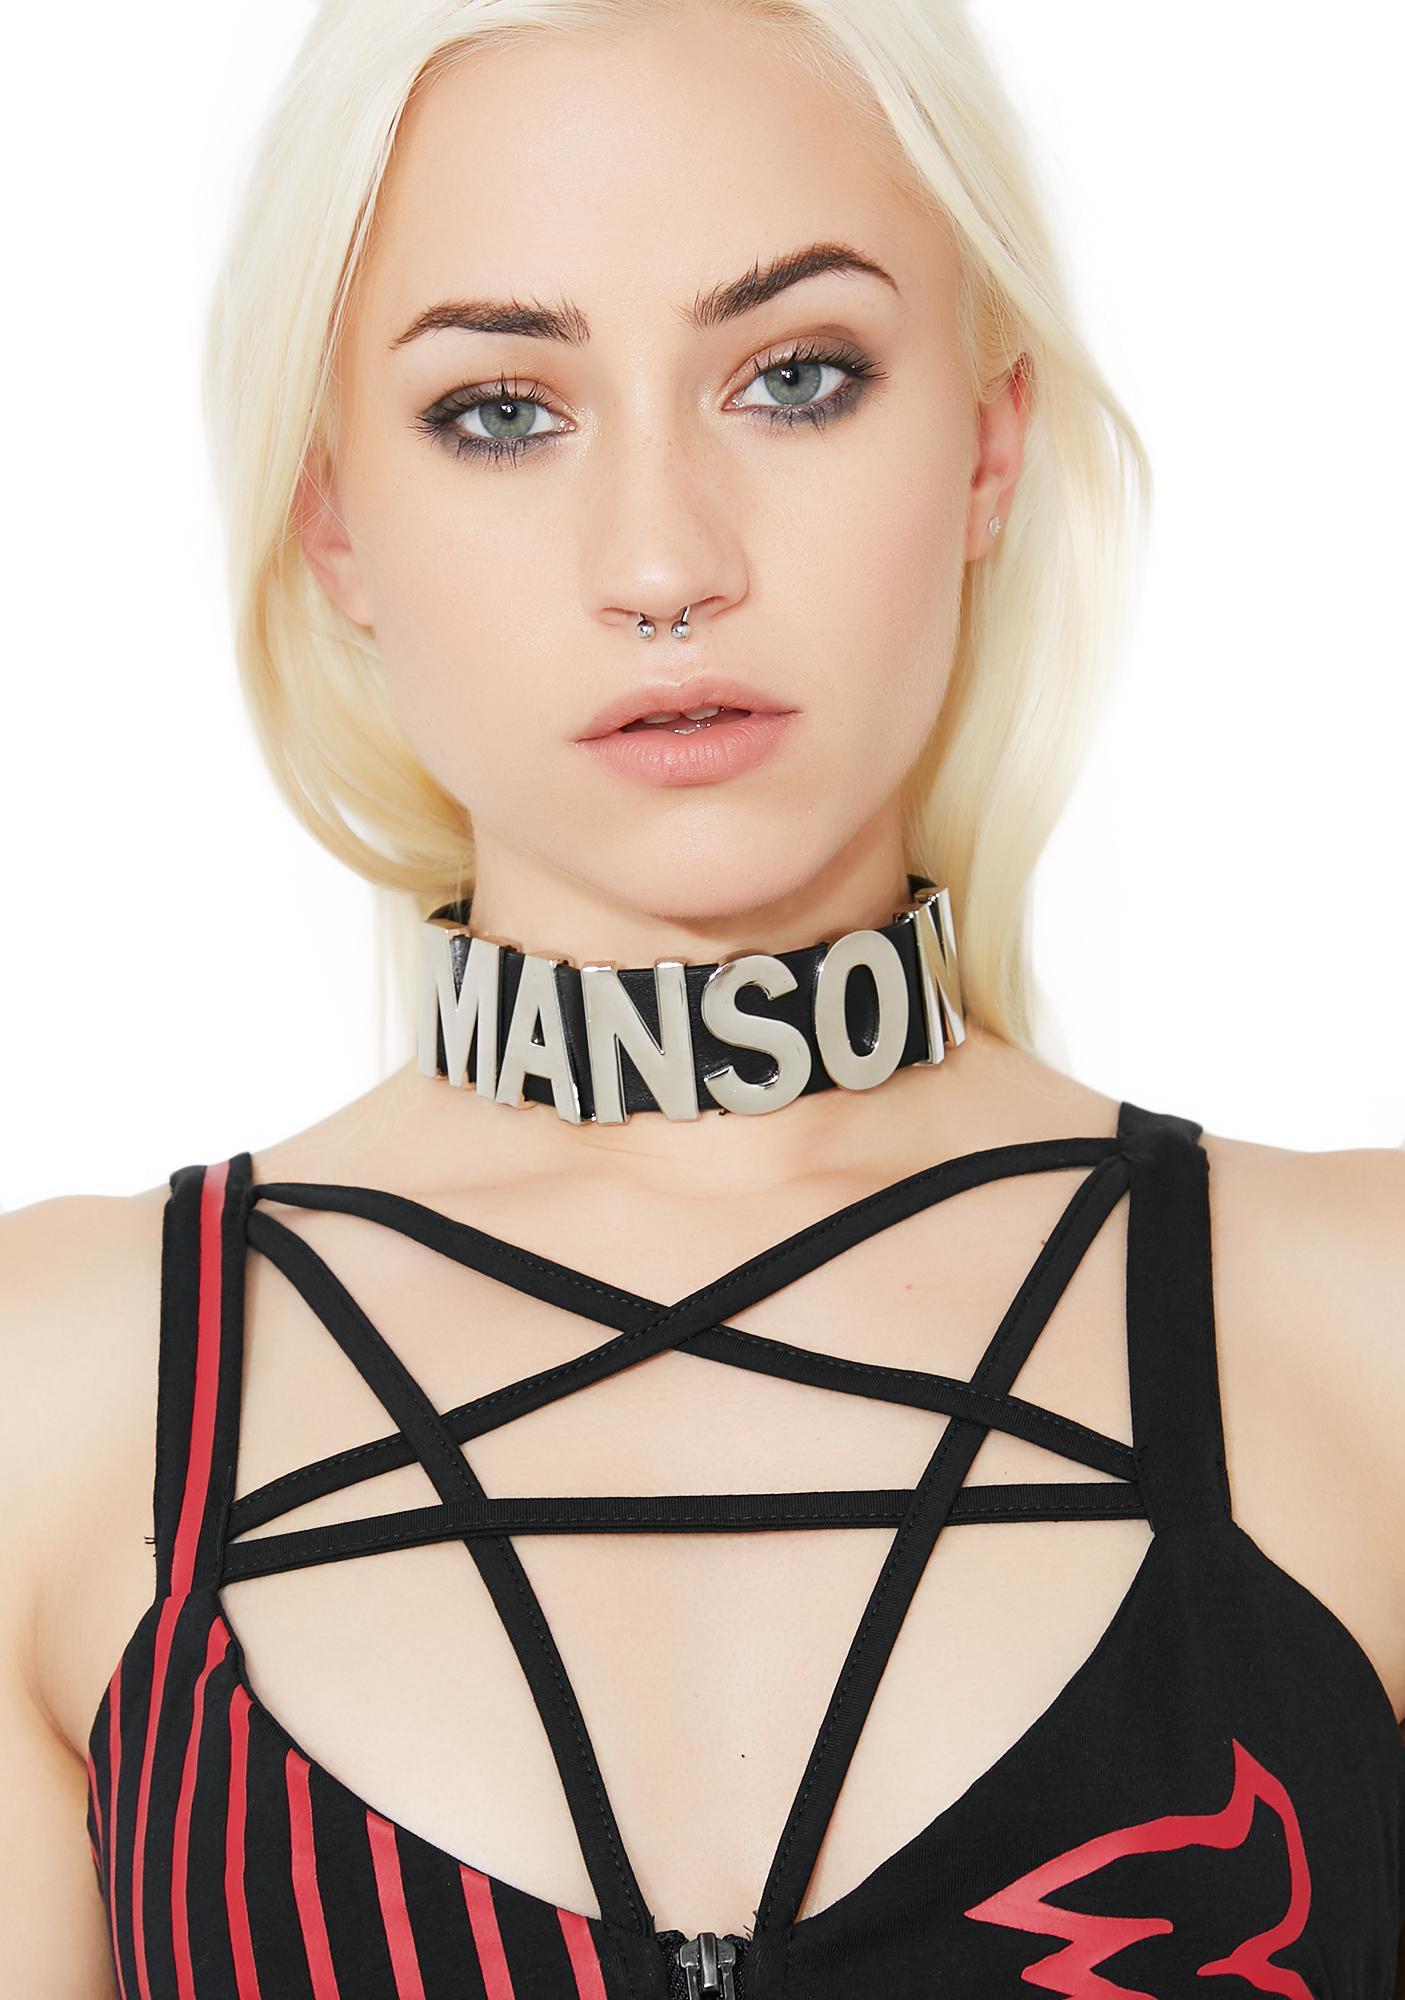 Killstar My Manson Letter Choker